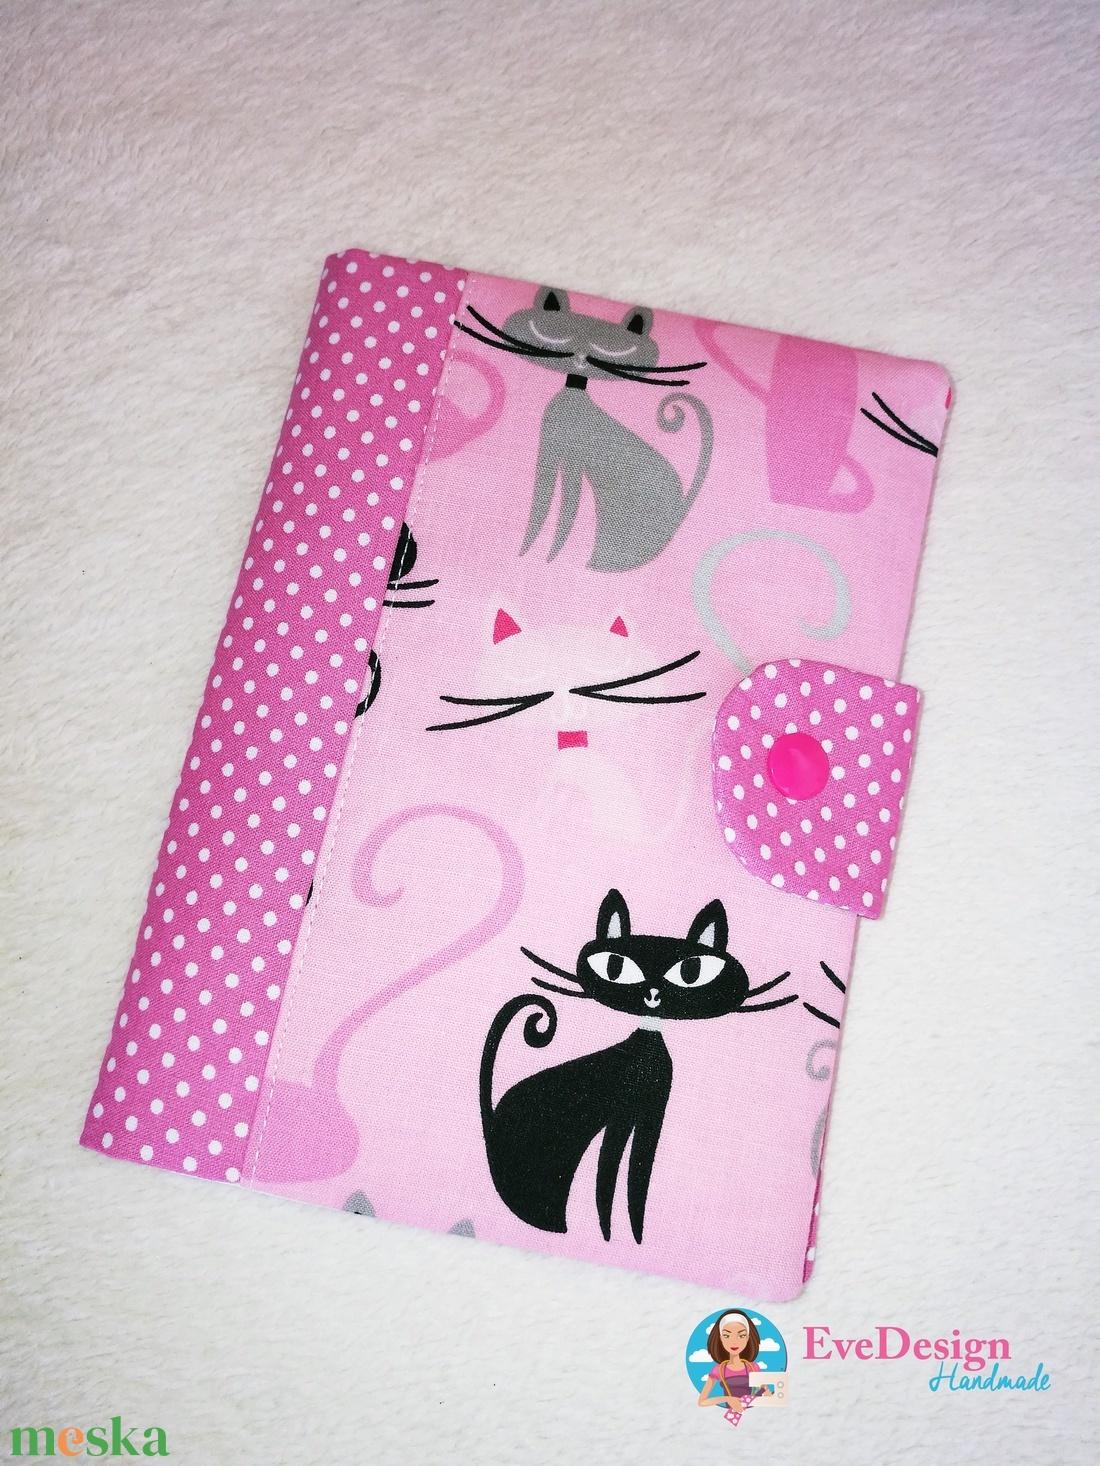 Eü kiskönyv borító textilből-szürke (EveDesign) - Meska.hu